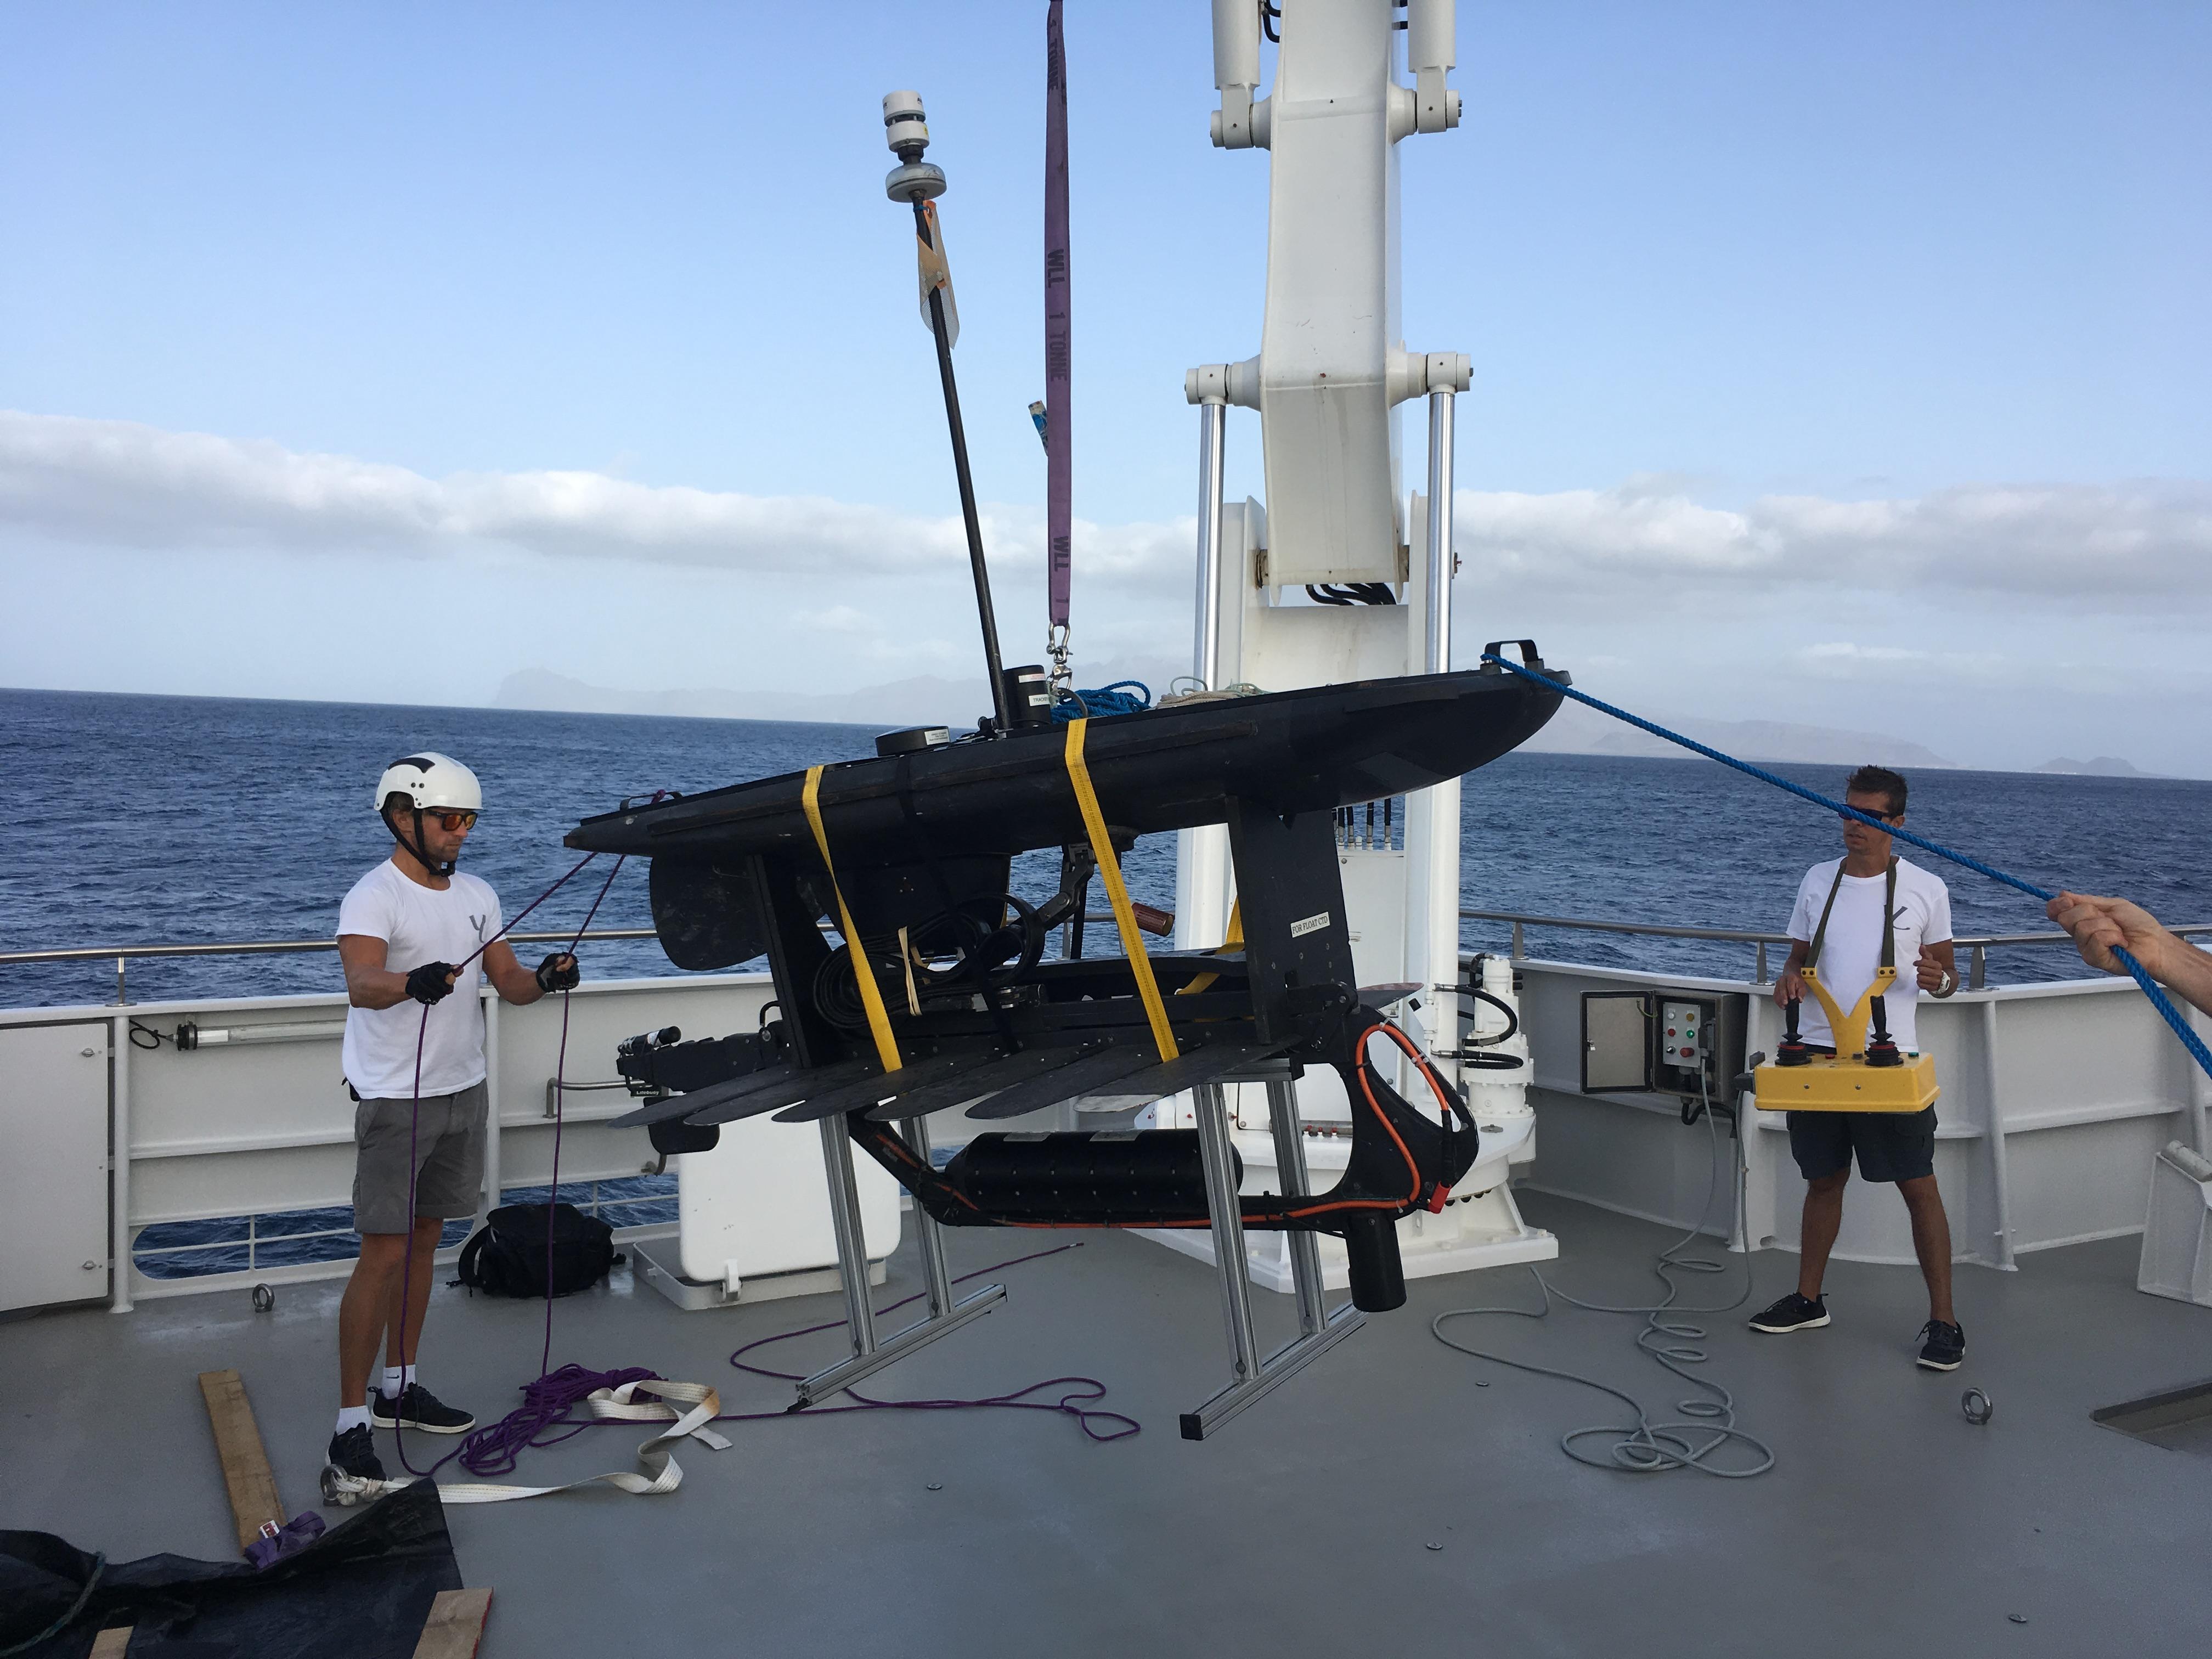 Recuperation_Bottom_lander_Geomar_SenghorMount_112m_MISSION Cabo Verde_©O.Borde_Monaco Explorations